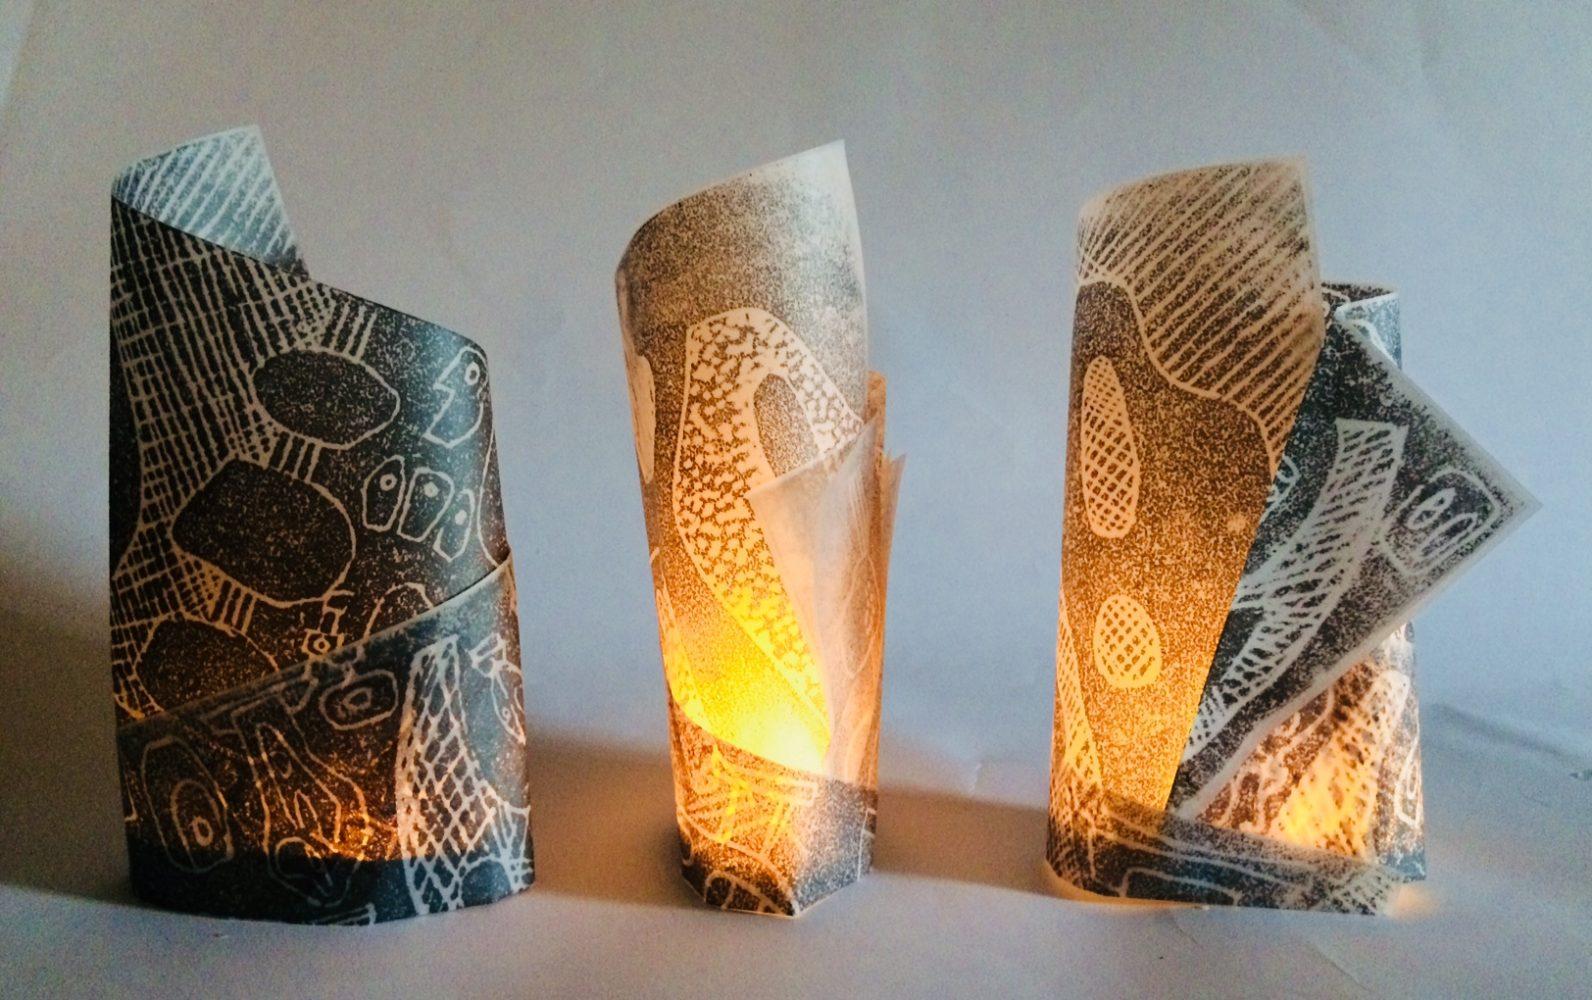 Hepworth Winter Lanterns